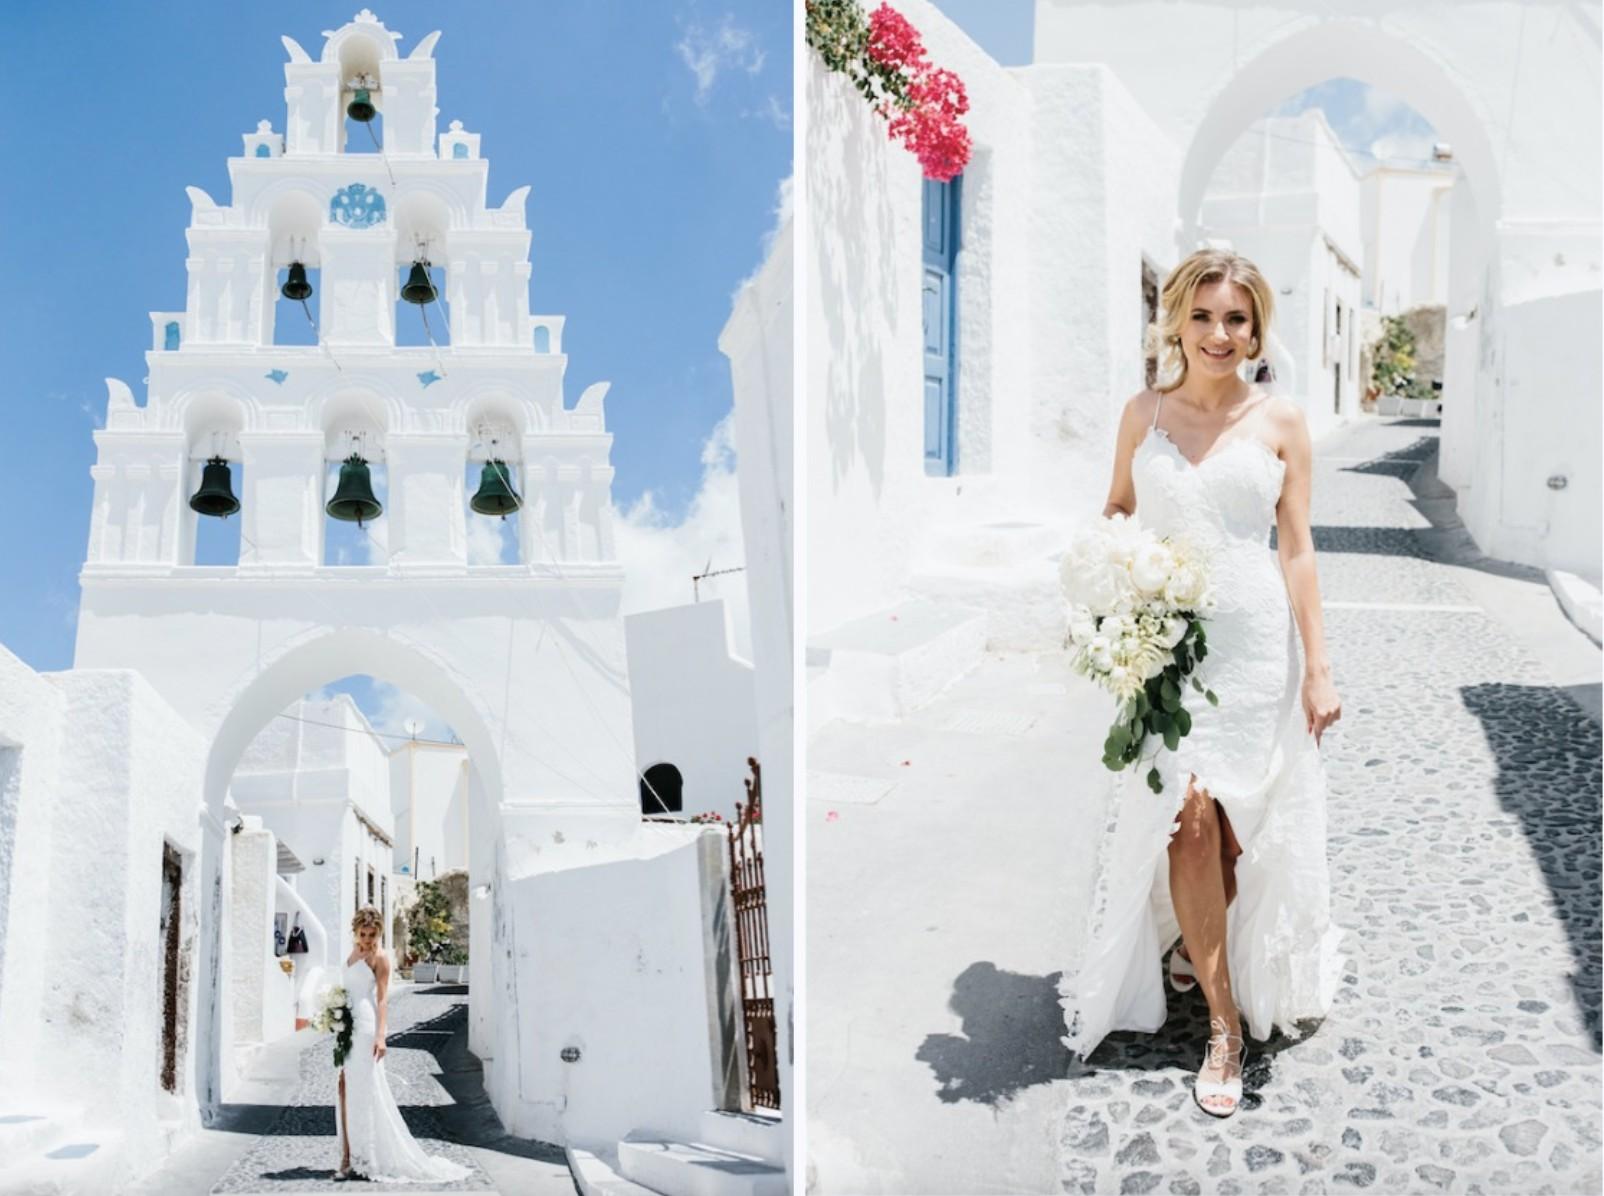 CAMILLA-KIRK-PHOTOGRAPHY-SANTORINI-MADI-LANE-BRIDAL-EMELIA-LACE-WEDDING-DRESS-WITH-SPLIT